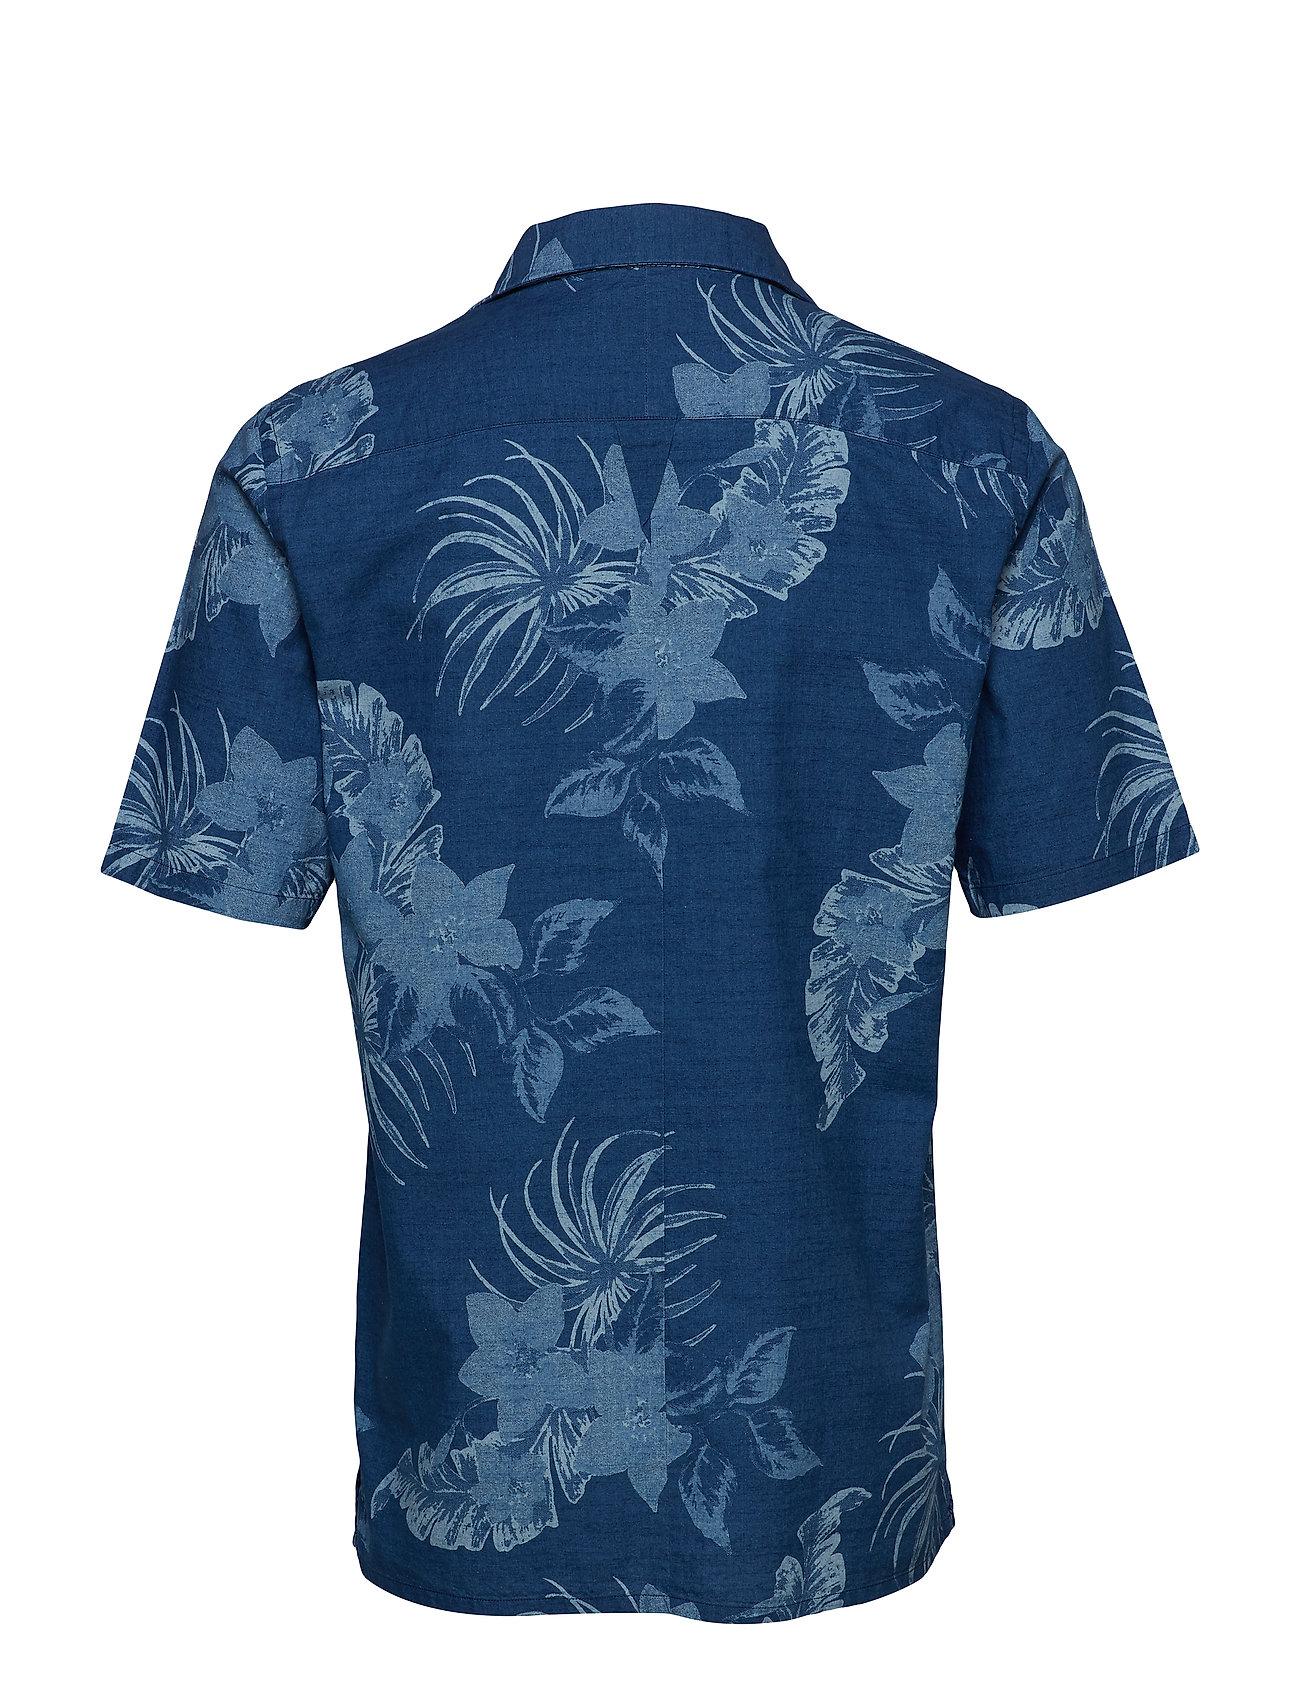 Indigo s De IndigoJunk S Resort Shirtwash Aop Luxe g6yf7vmYbI